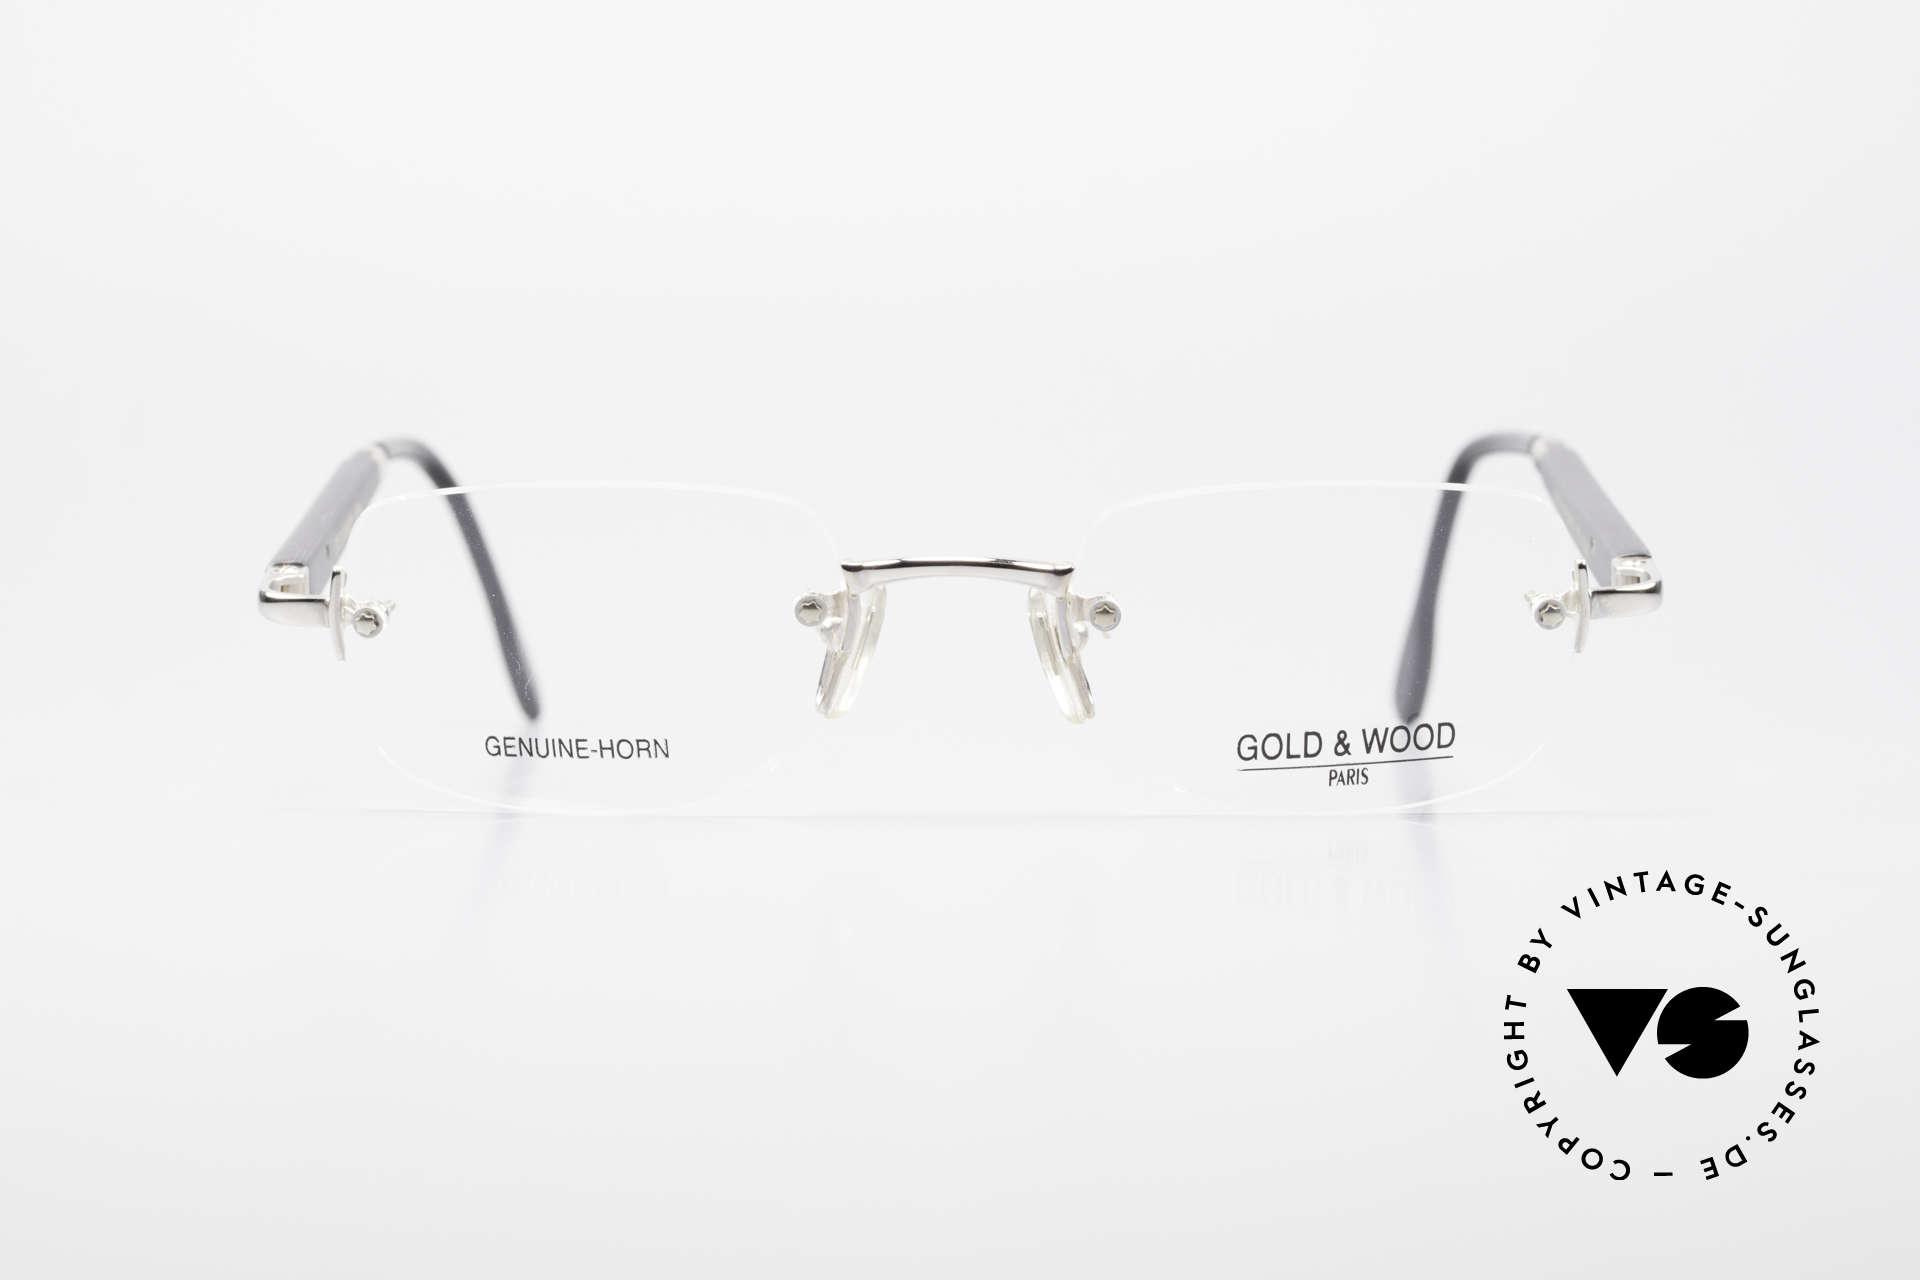 Gold & Wood 332 Genuine Horn Rimless Glasses, rimless LUXURY horn eyeglass-frame from 2001, Made for Men and Women